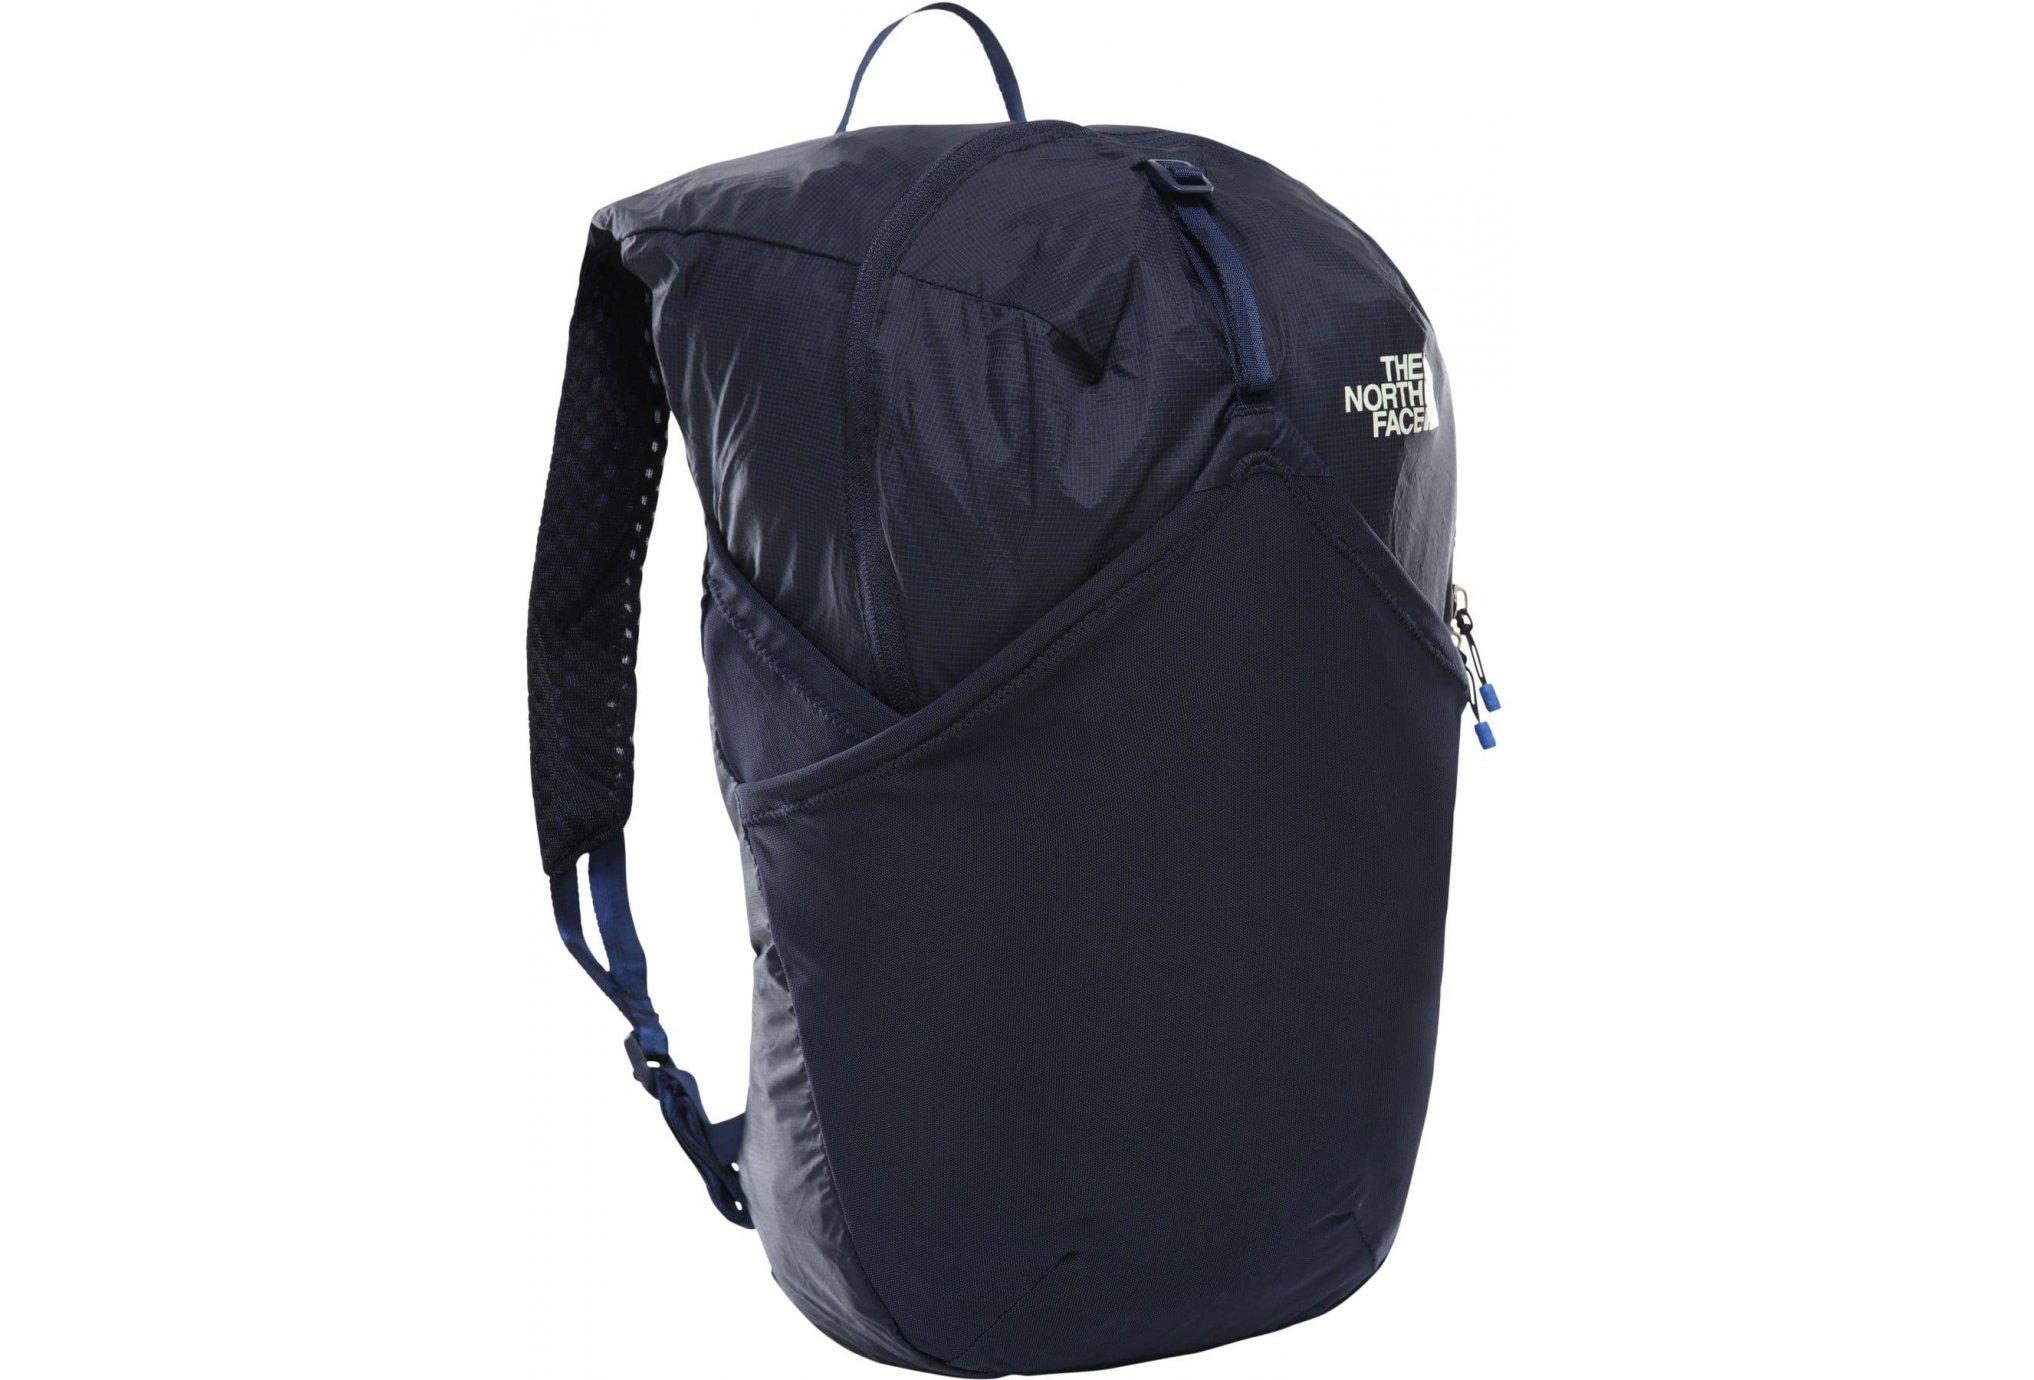 The North Face Sac à dos Flyweight Pack Sac à dos